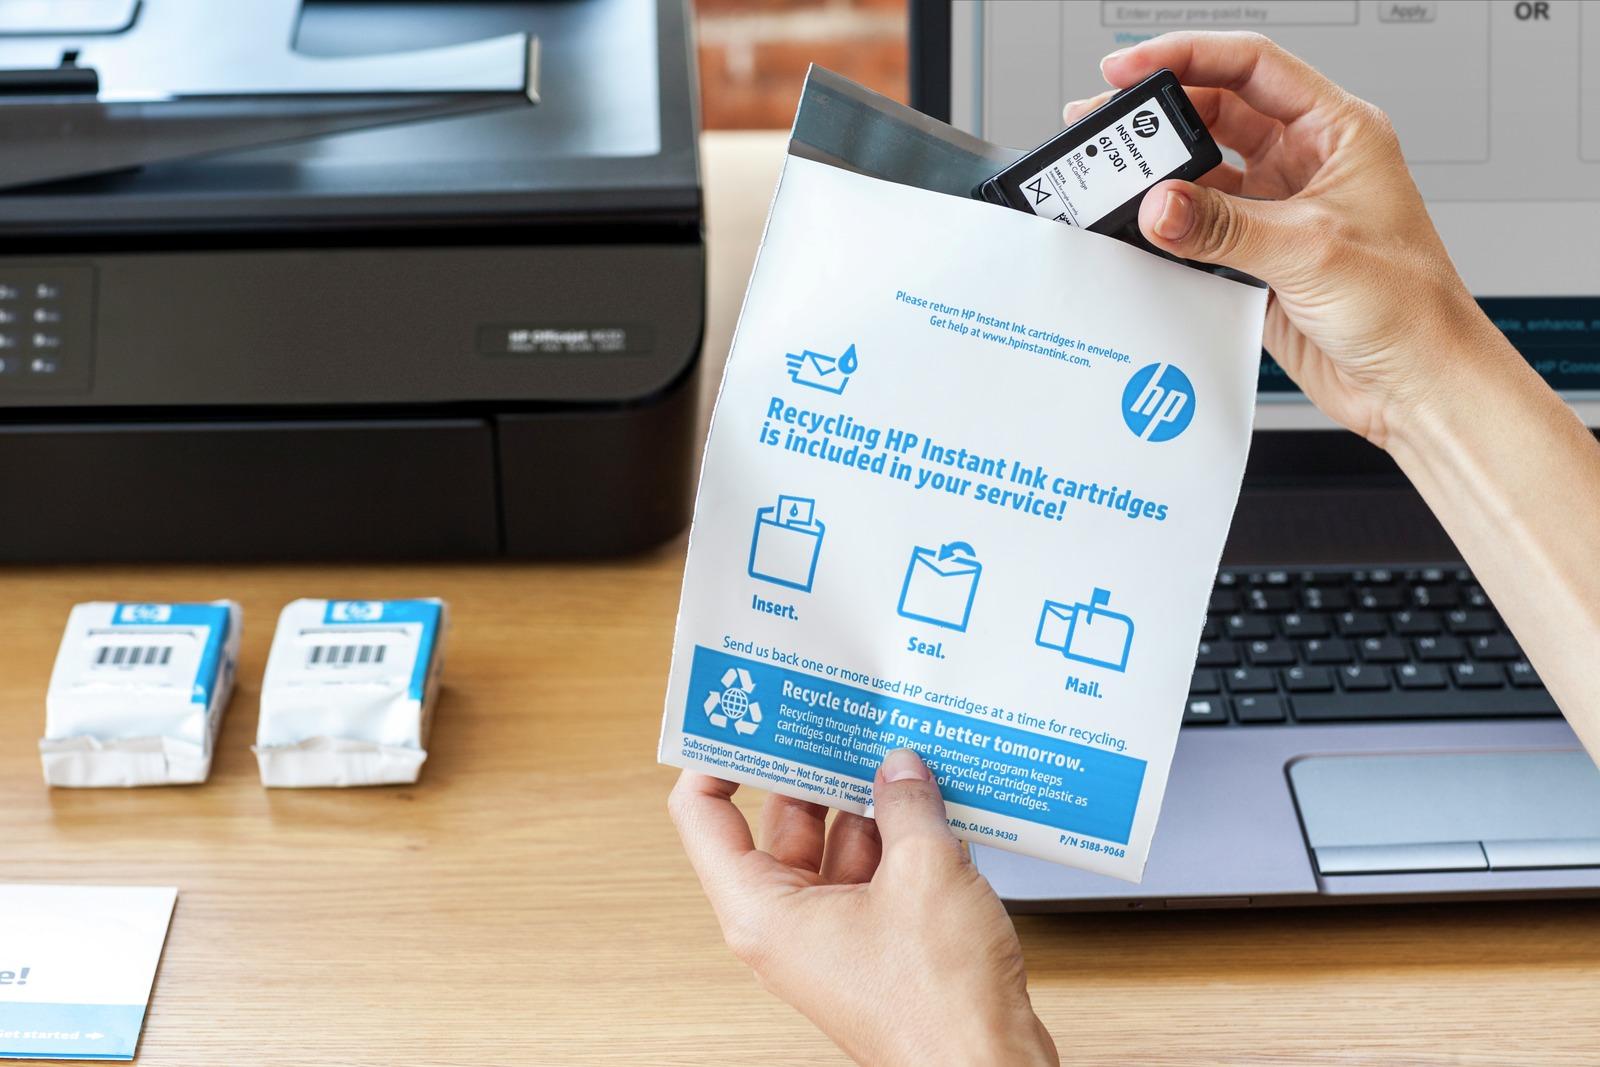 10 ways to save big on printer ink and toner – HP instant ink envelope mailer